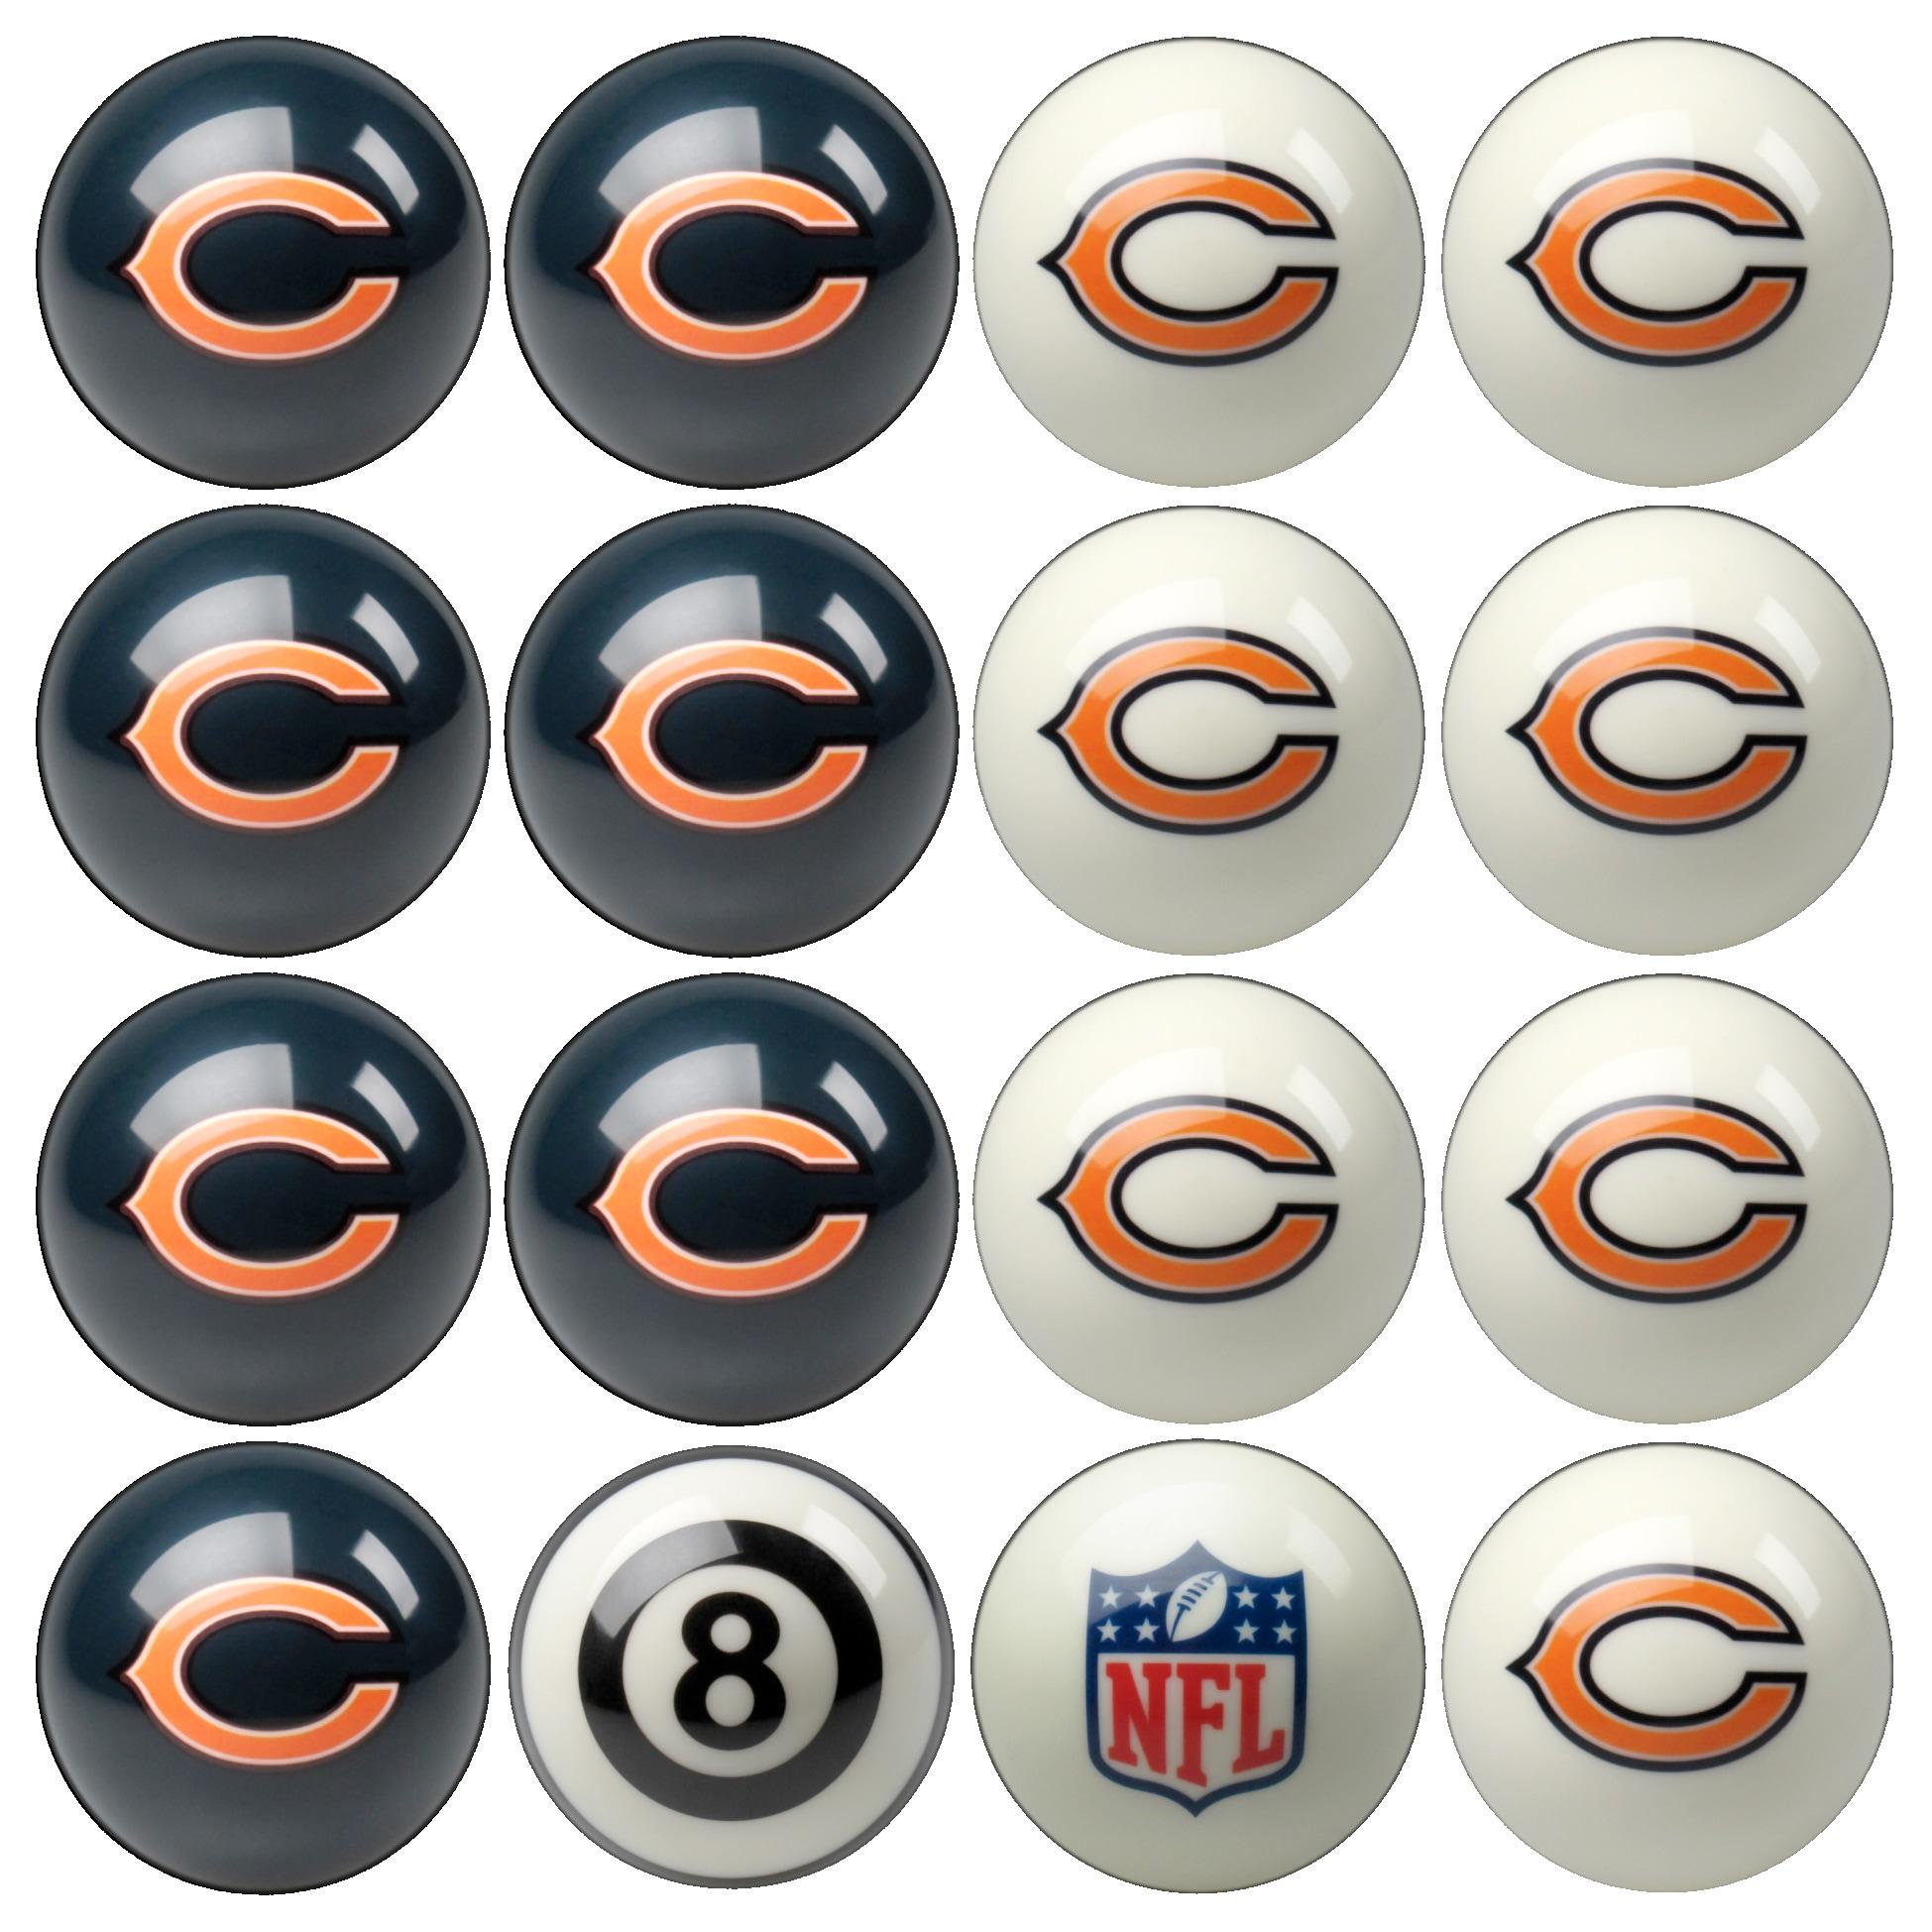 Chicago Bears NFL Billiard Ball Set